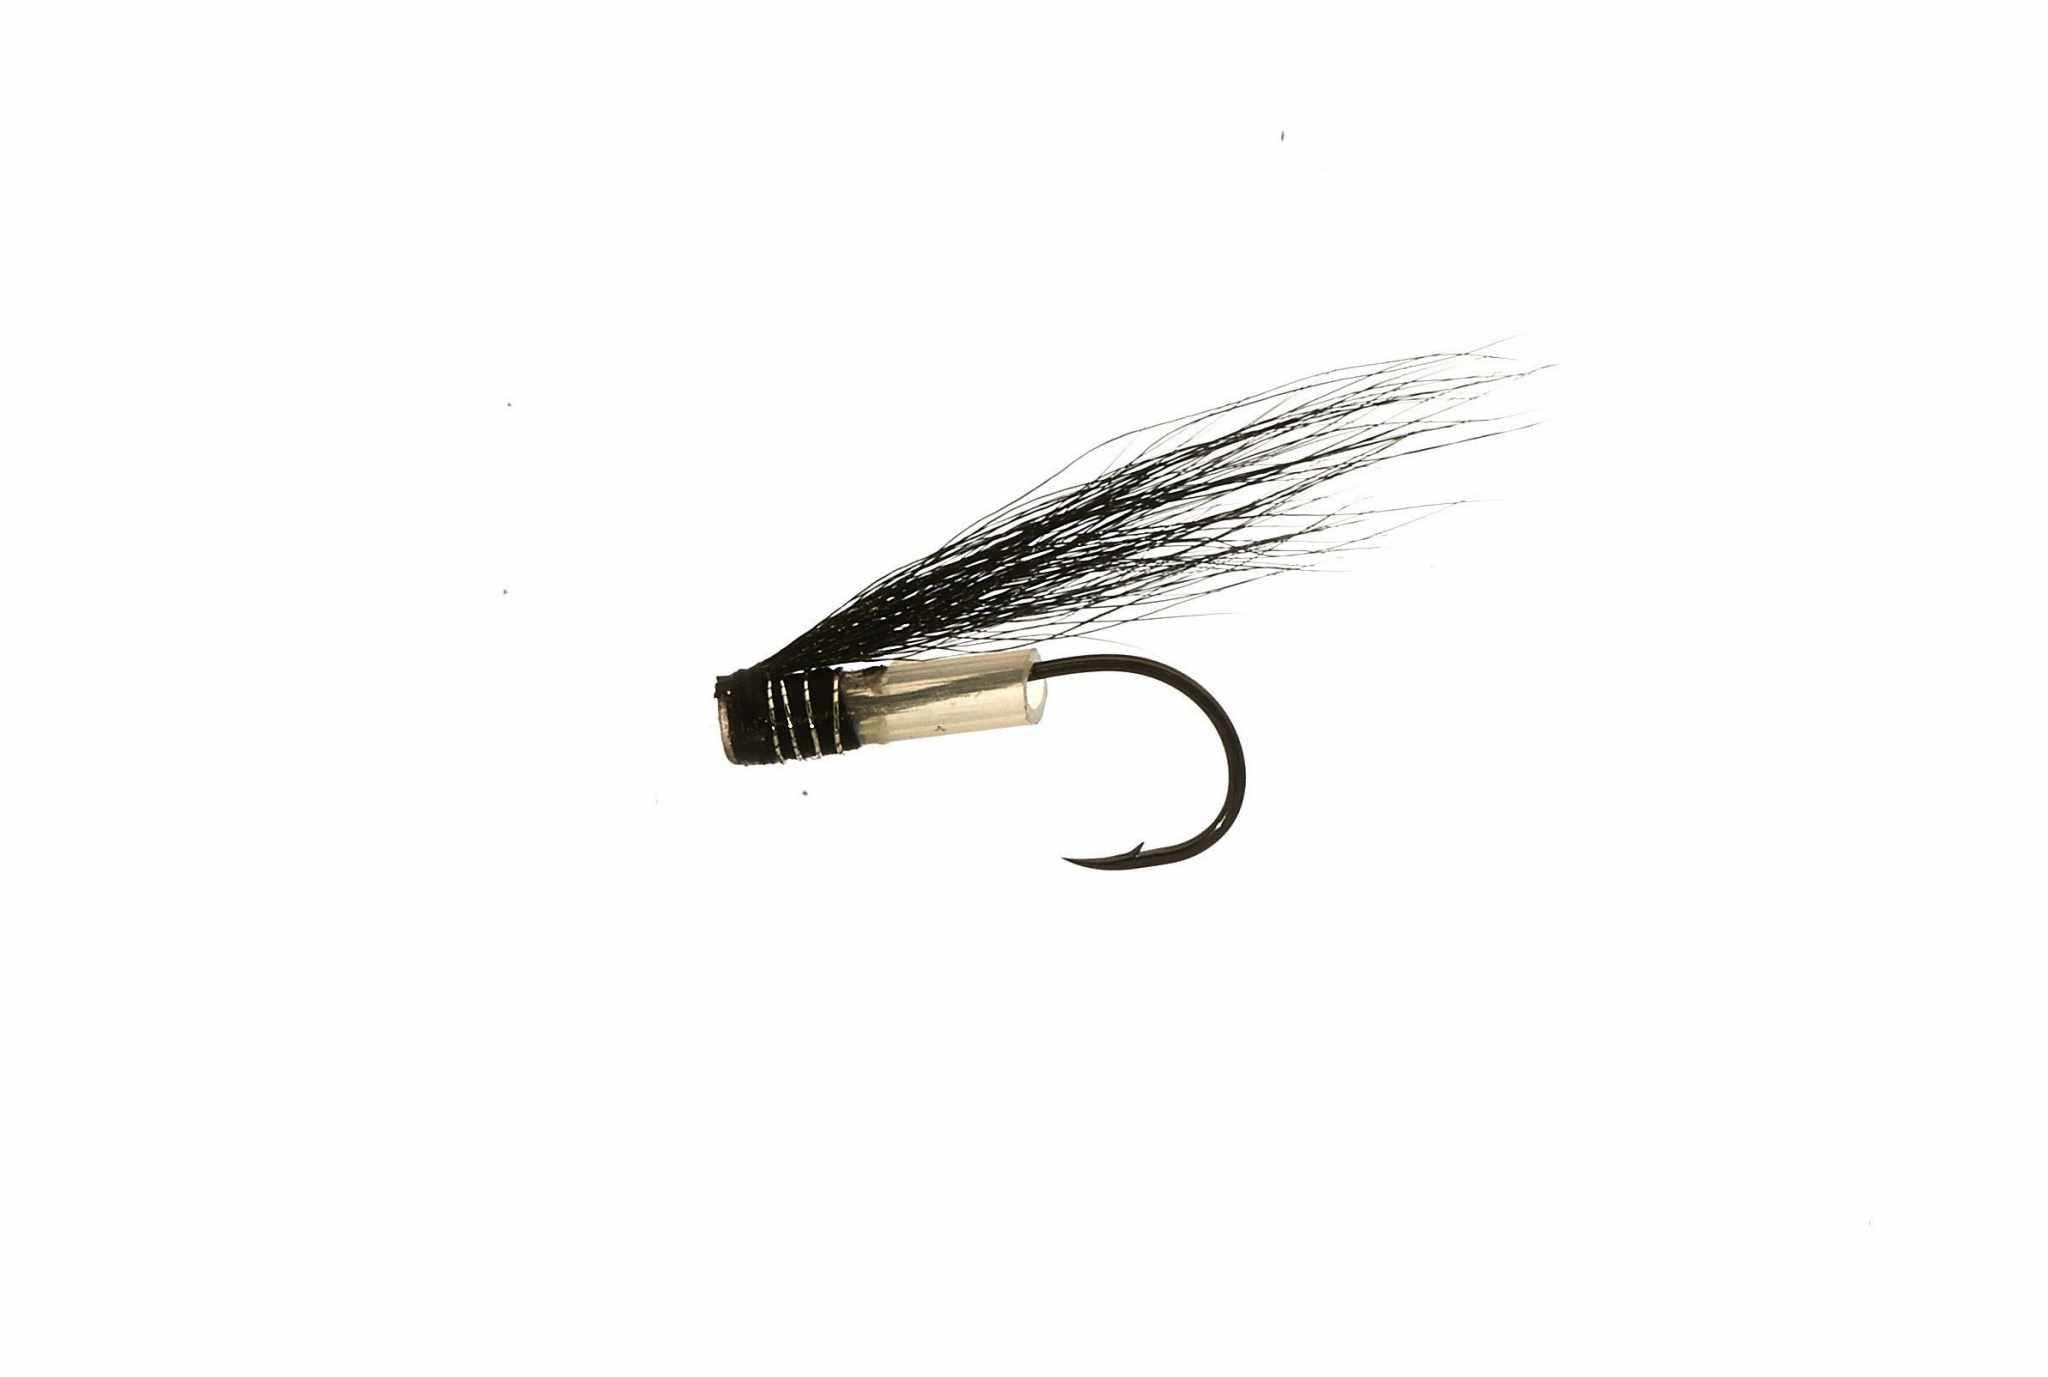 Micro V-Fly - Black - Stoat tail